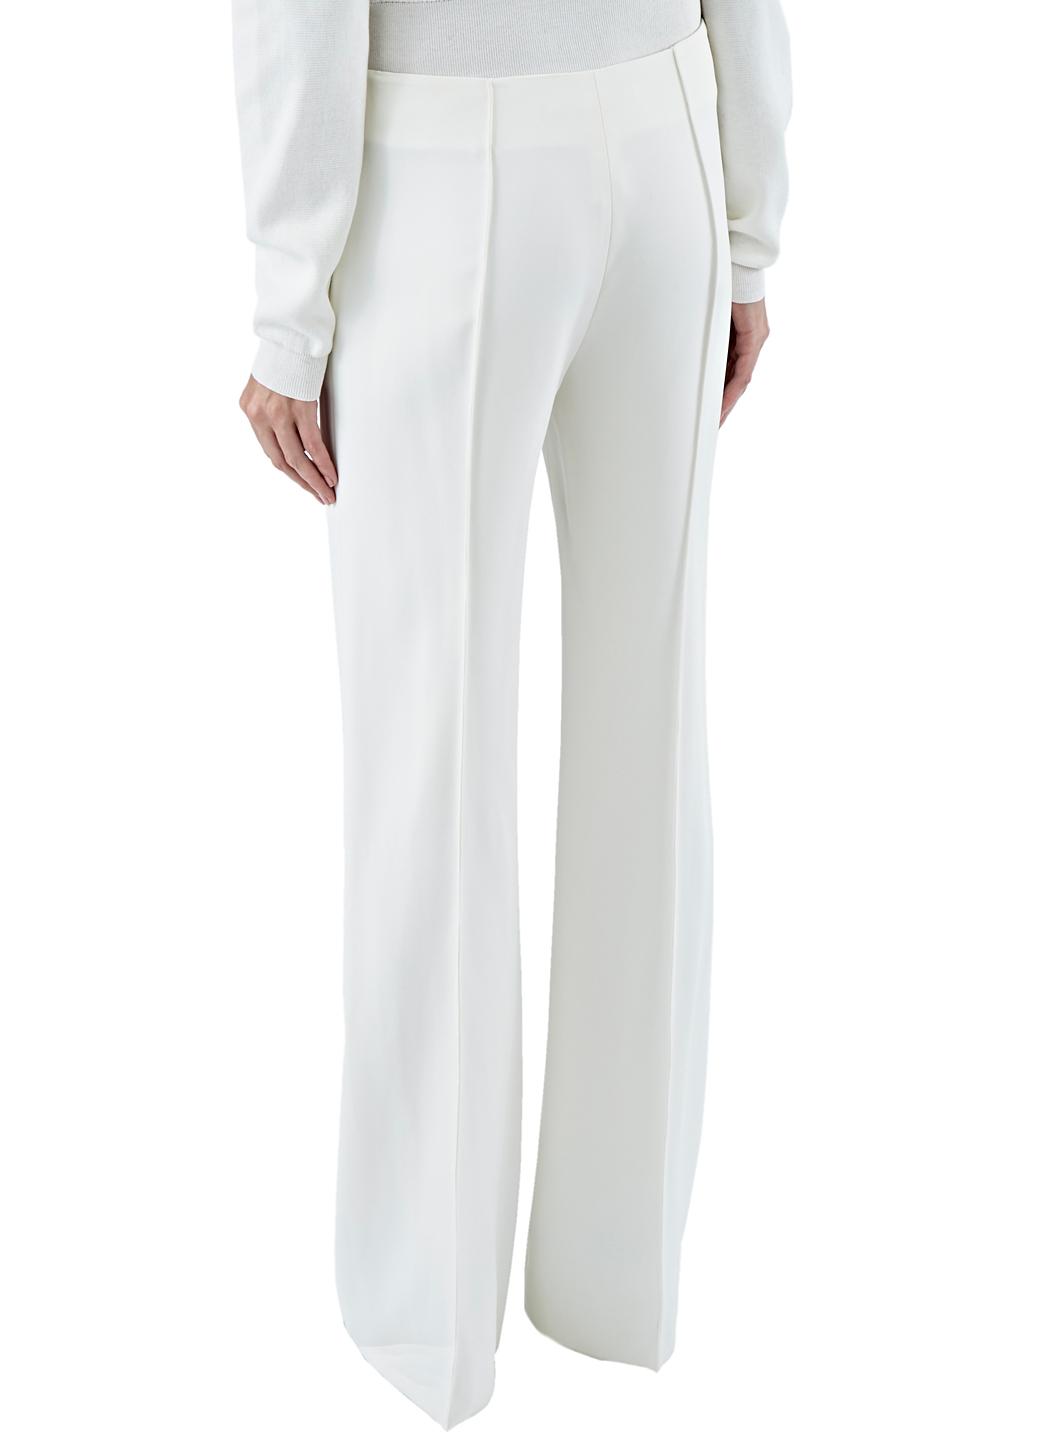 532024fdaea7d Lyst - Agnona Women s Wide Leg Pants In Off-white in White